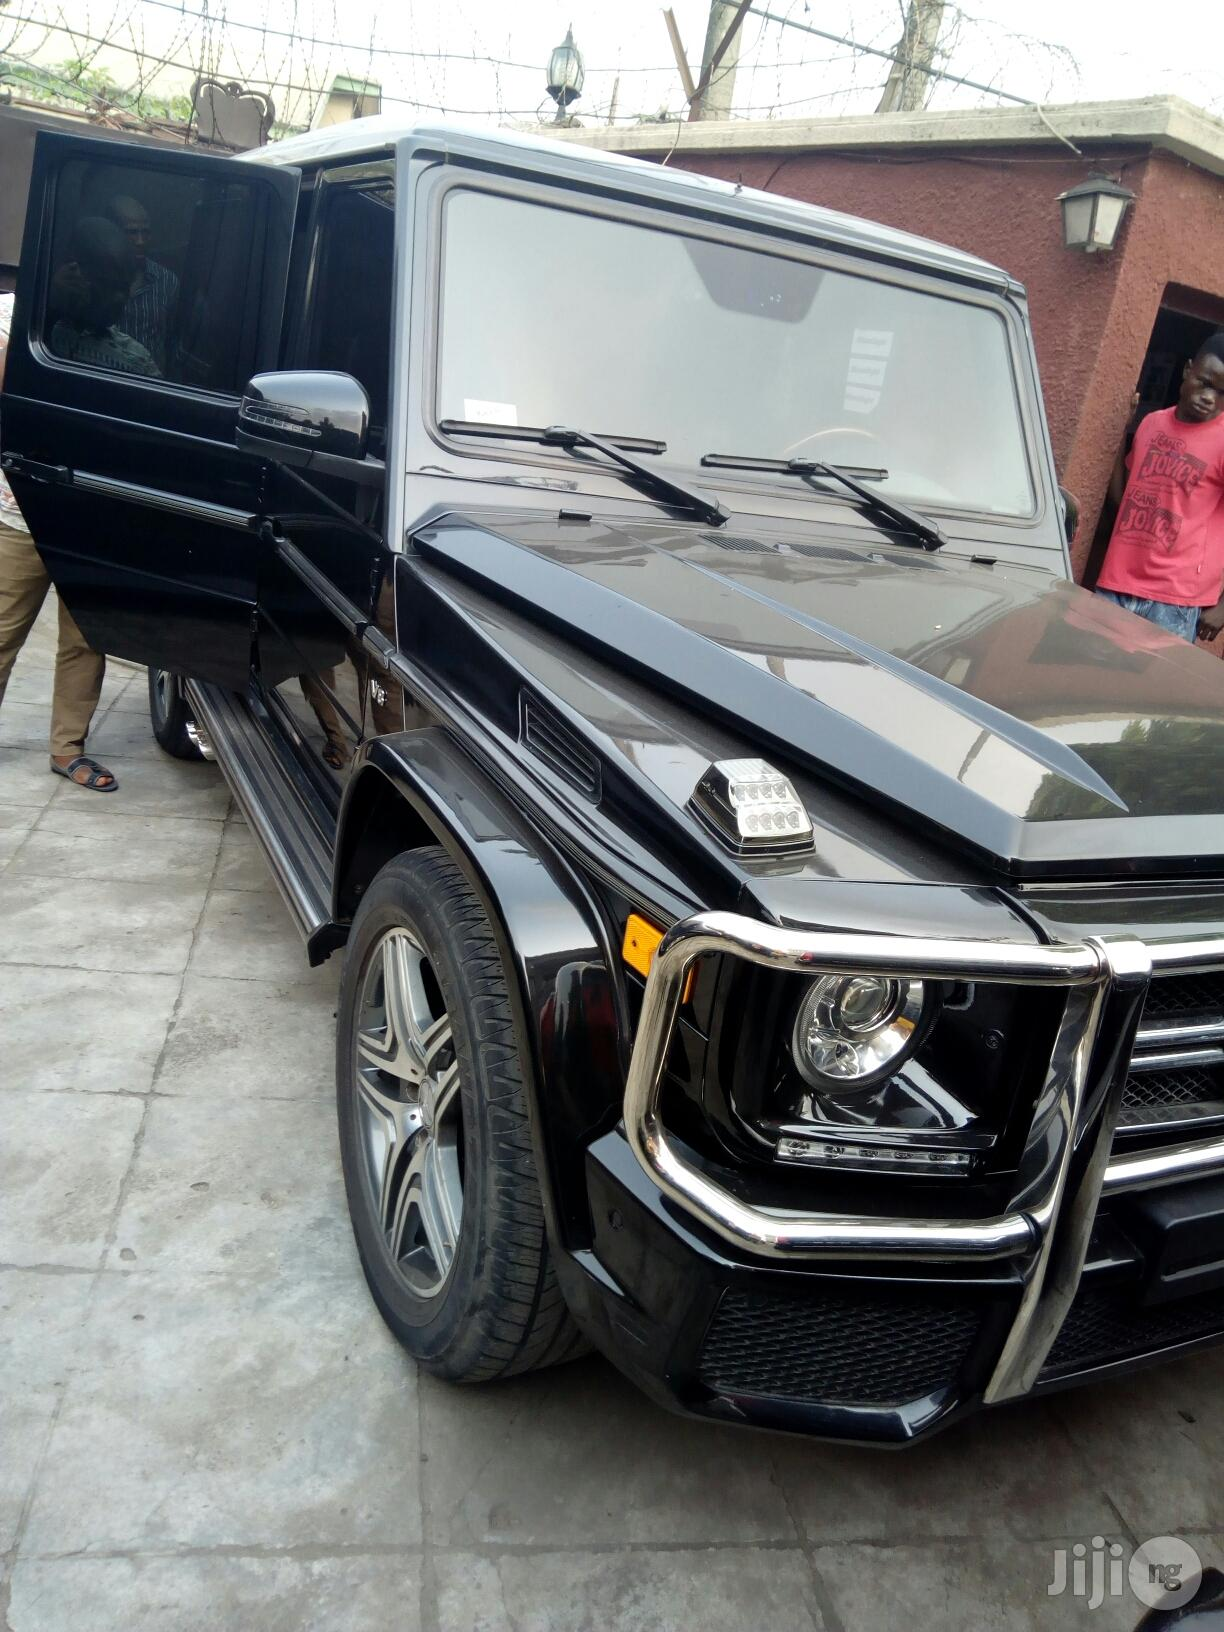 Mercedes-Benz G-Class 2009 Black | Cars for sale in Ikeja, Lagos State, Nigeria